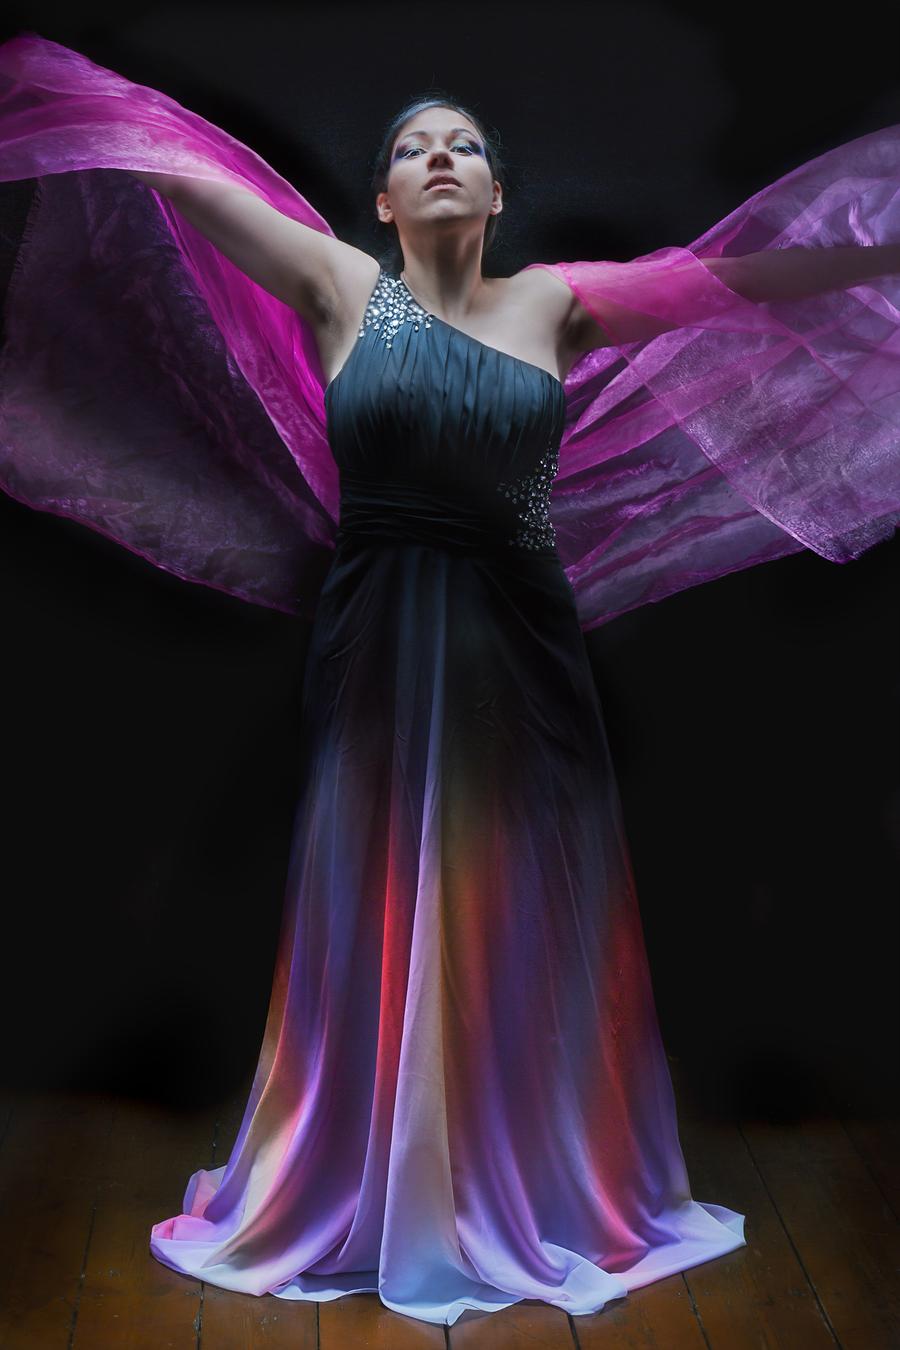 Iris - Goddess of the Rainbow / Photography by Stuart Runham (Pinupzania), Model phantom_elfsire, Stylist phantom_elfsire, Stylist Stuart Runham (Pinupzania) / Uploaded 27th February 2020 @ 05:35 PM